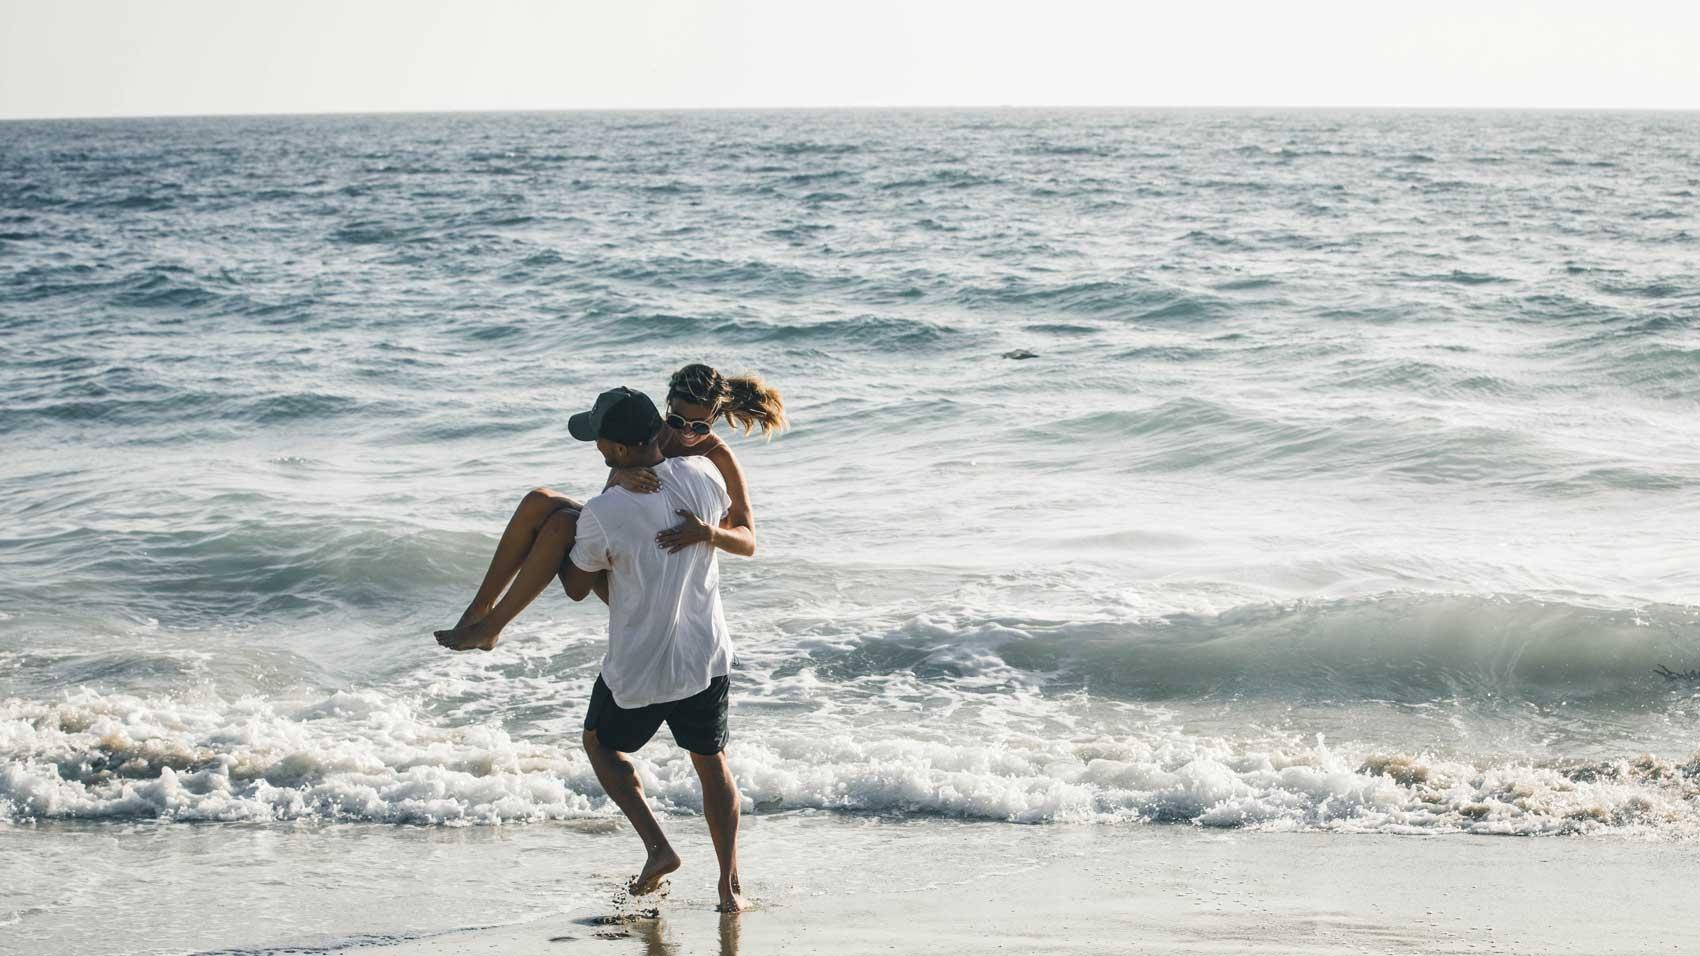 Couple having fun in ocean waves, Romantic getaways USA